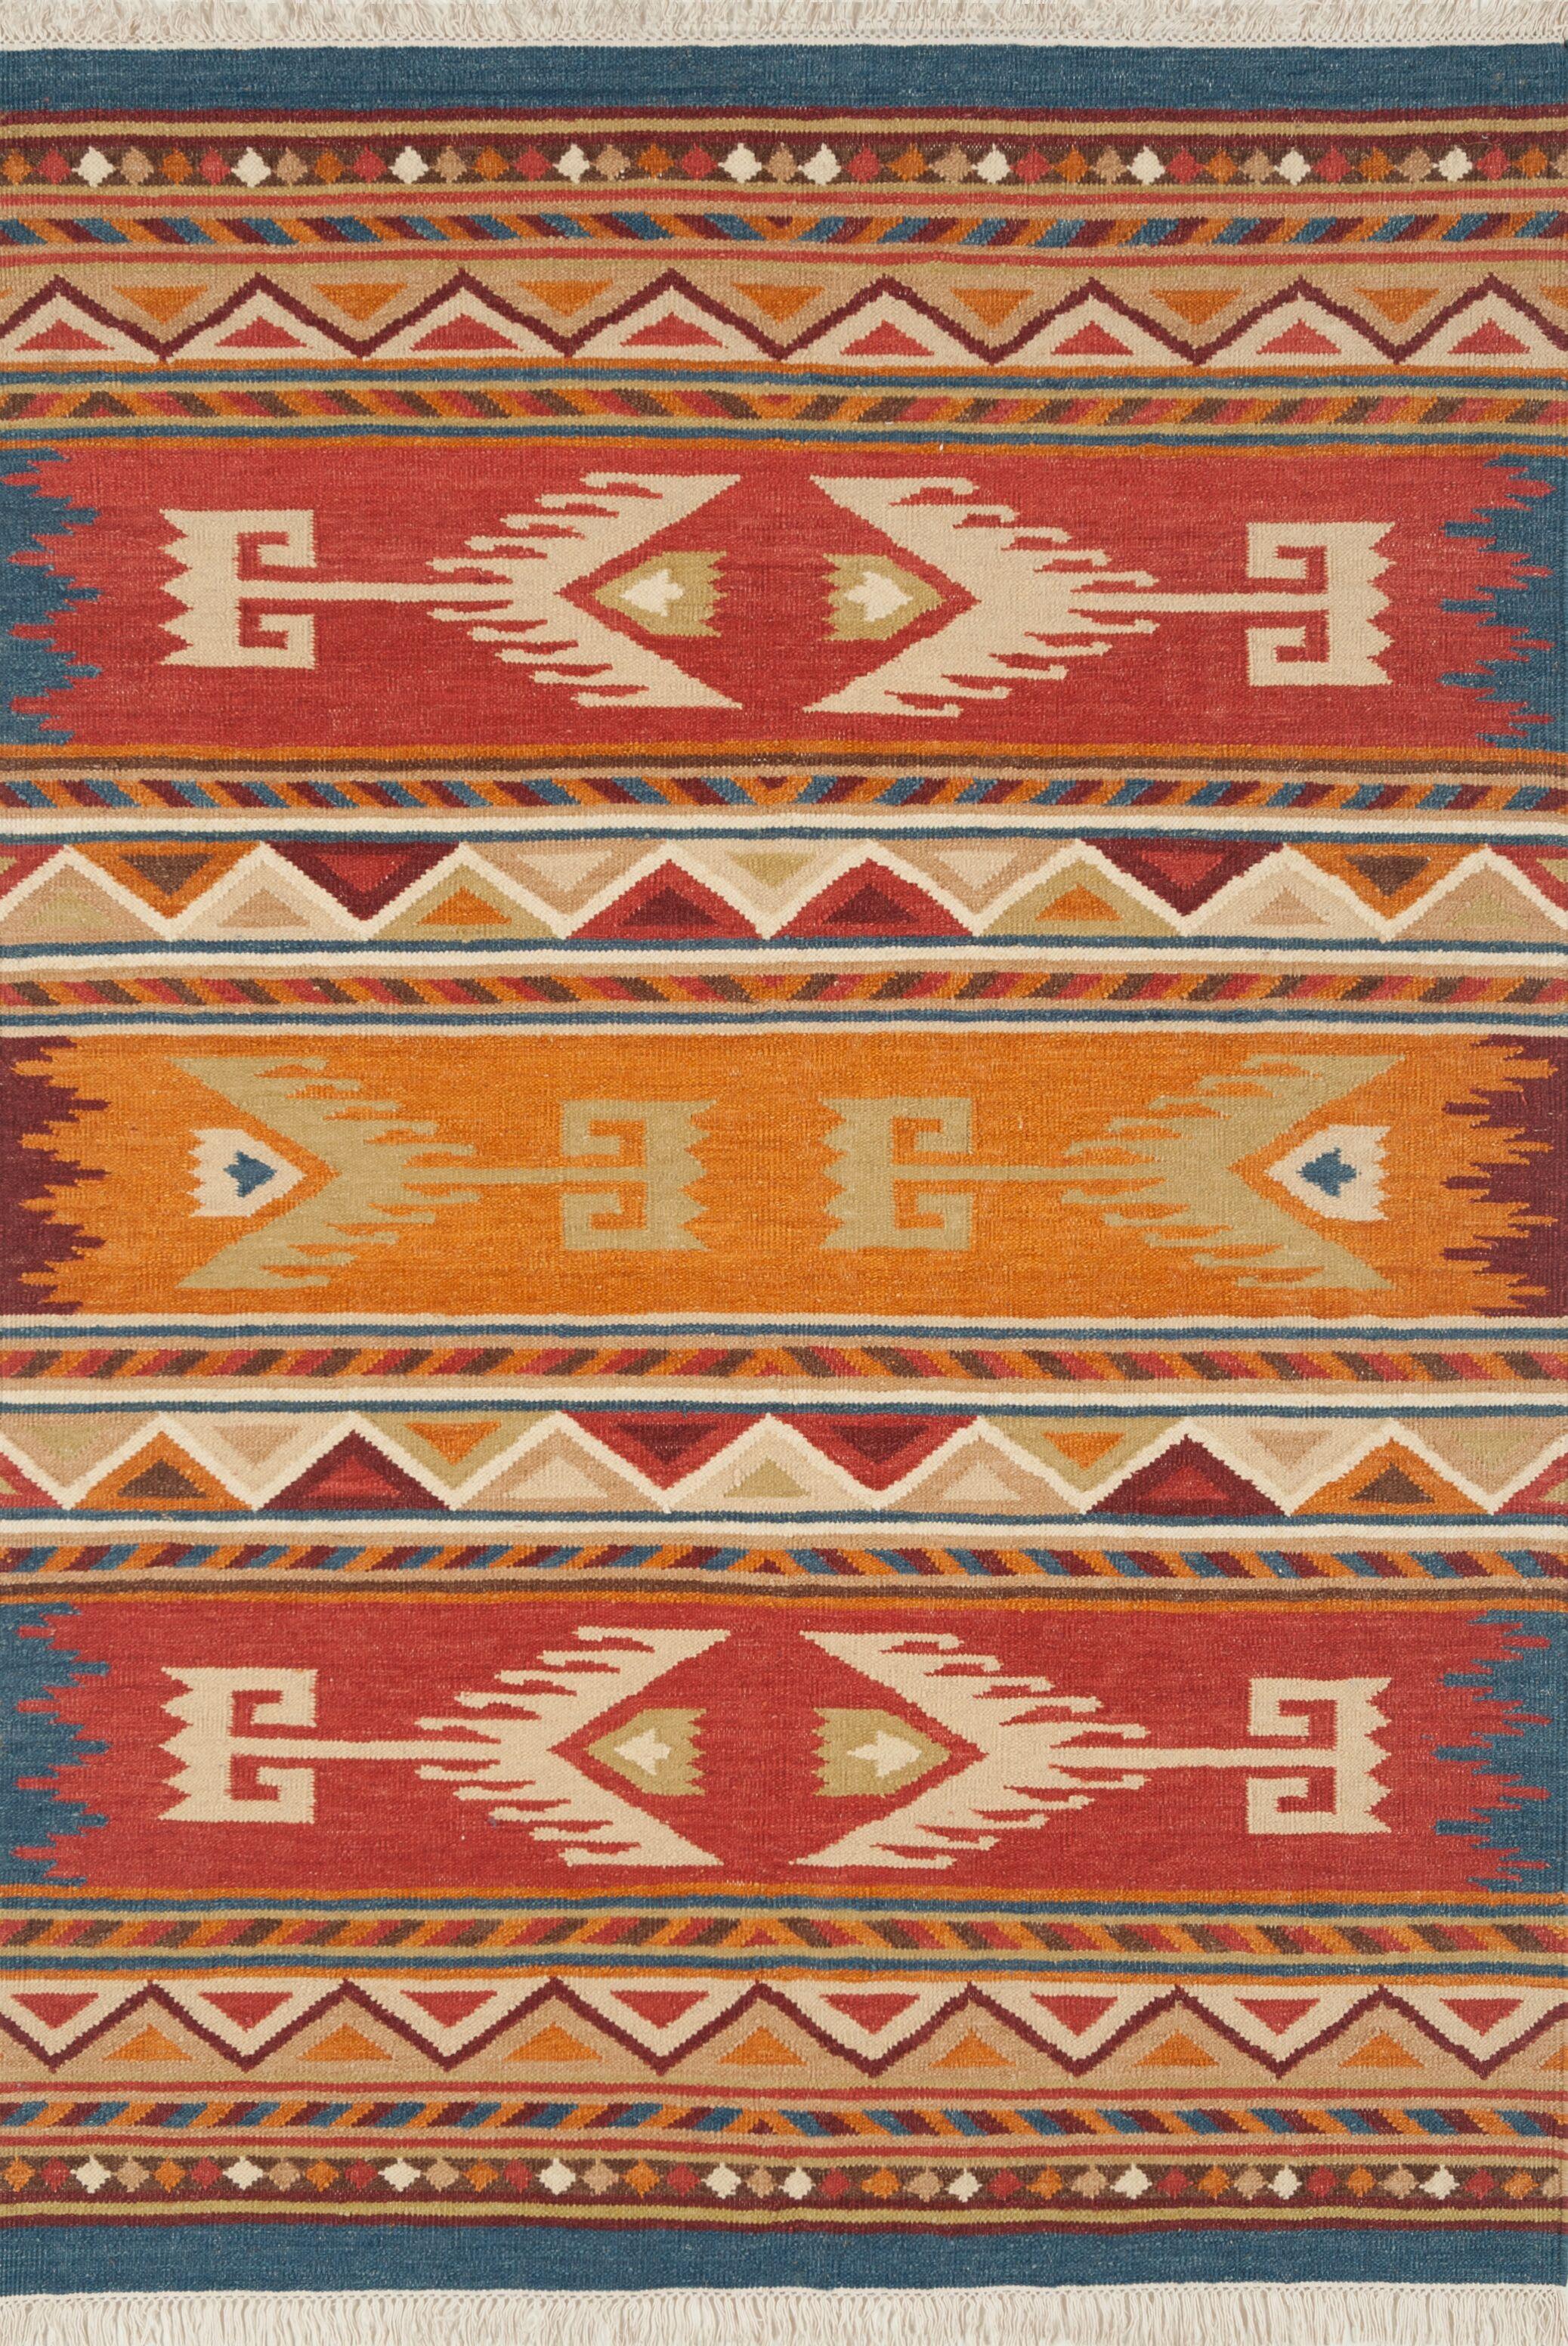 Lodge Hand-Woven Flatweave Wool Red/Orange Area Rug Rug Size: 8' x 10'